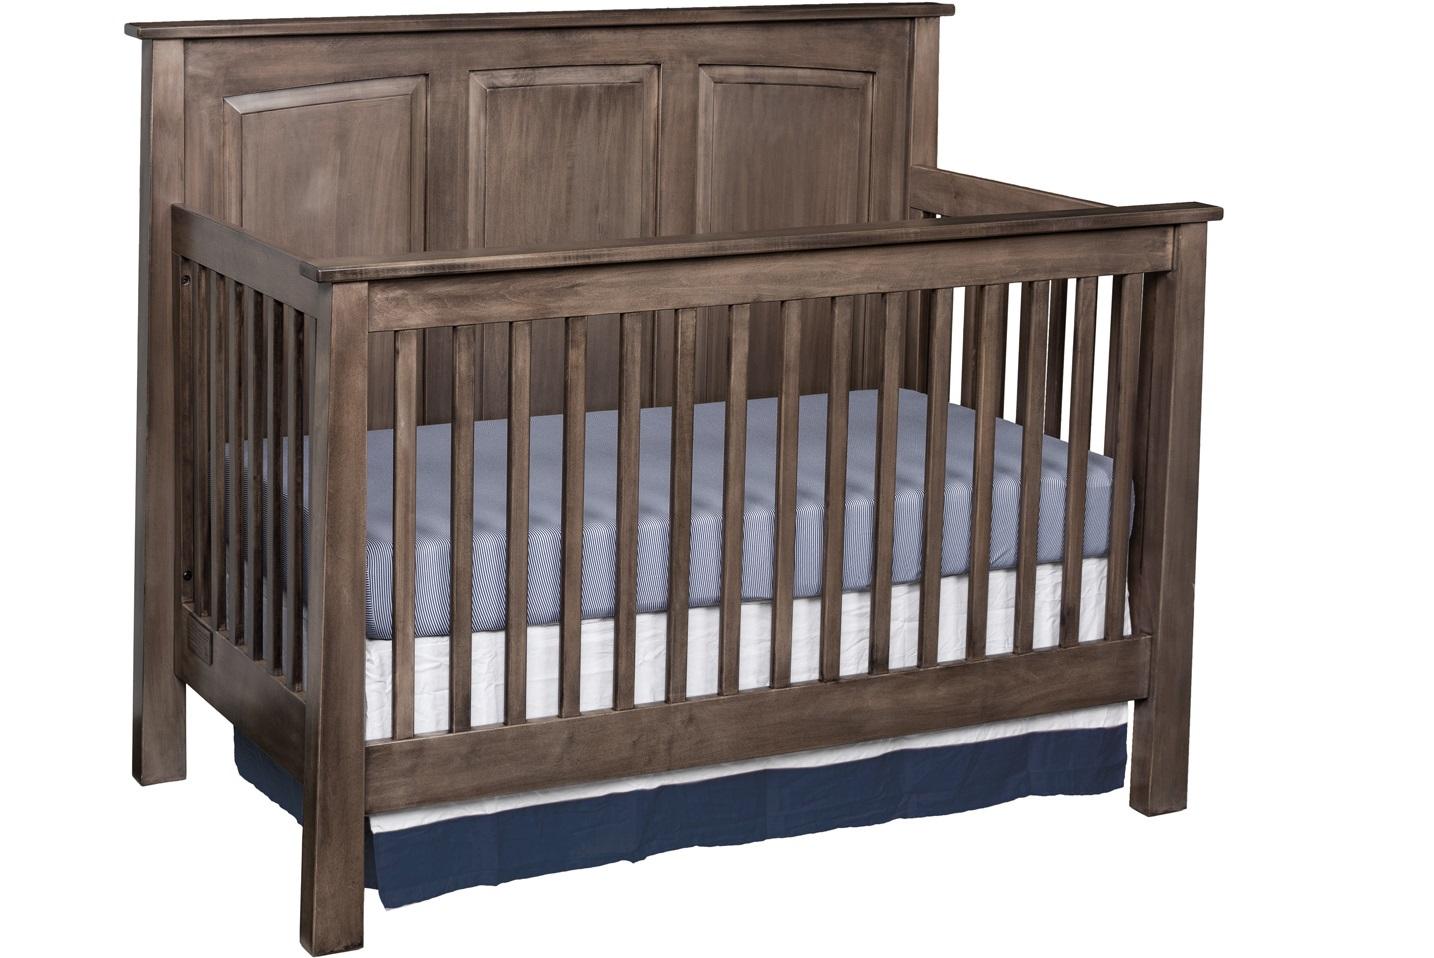 Shaker Panel Crib